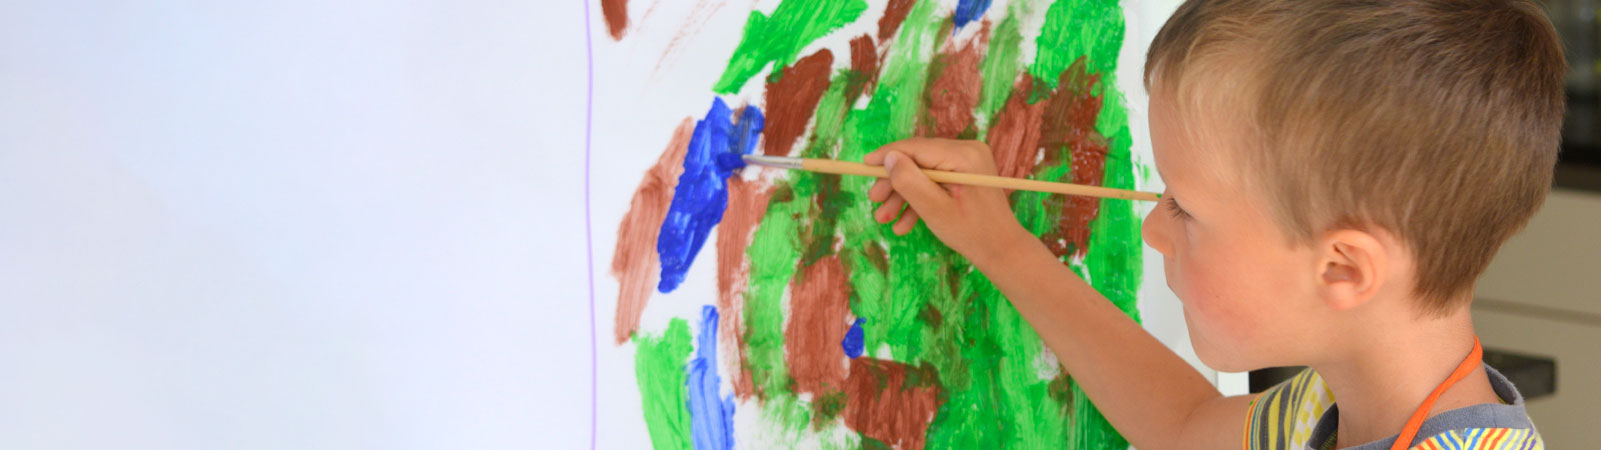 Pratiquer les Arts Plastiques